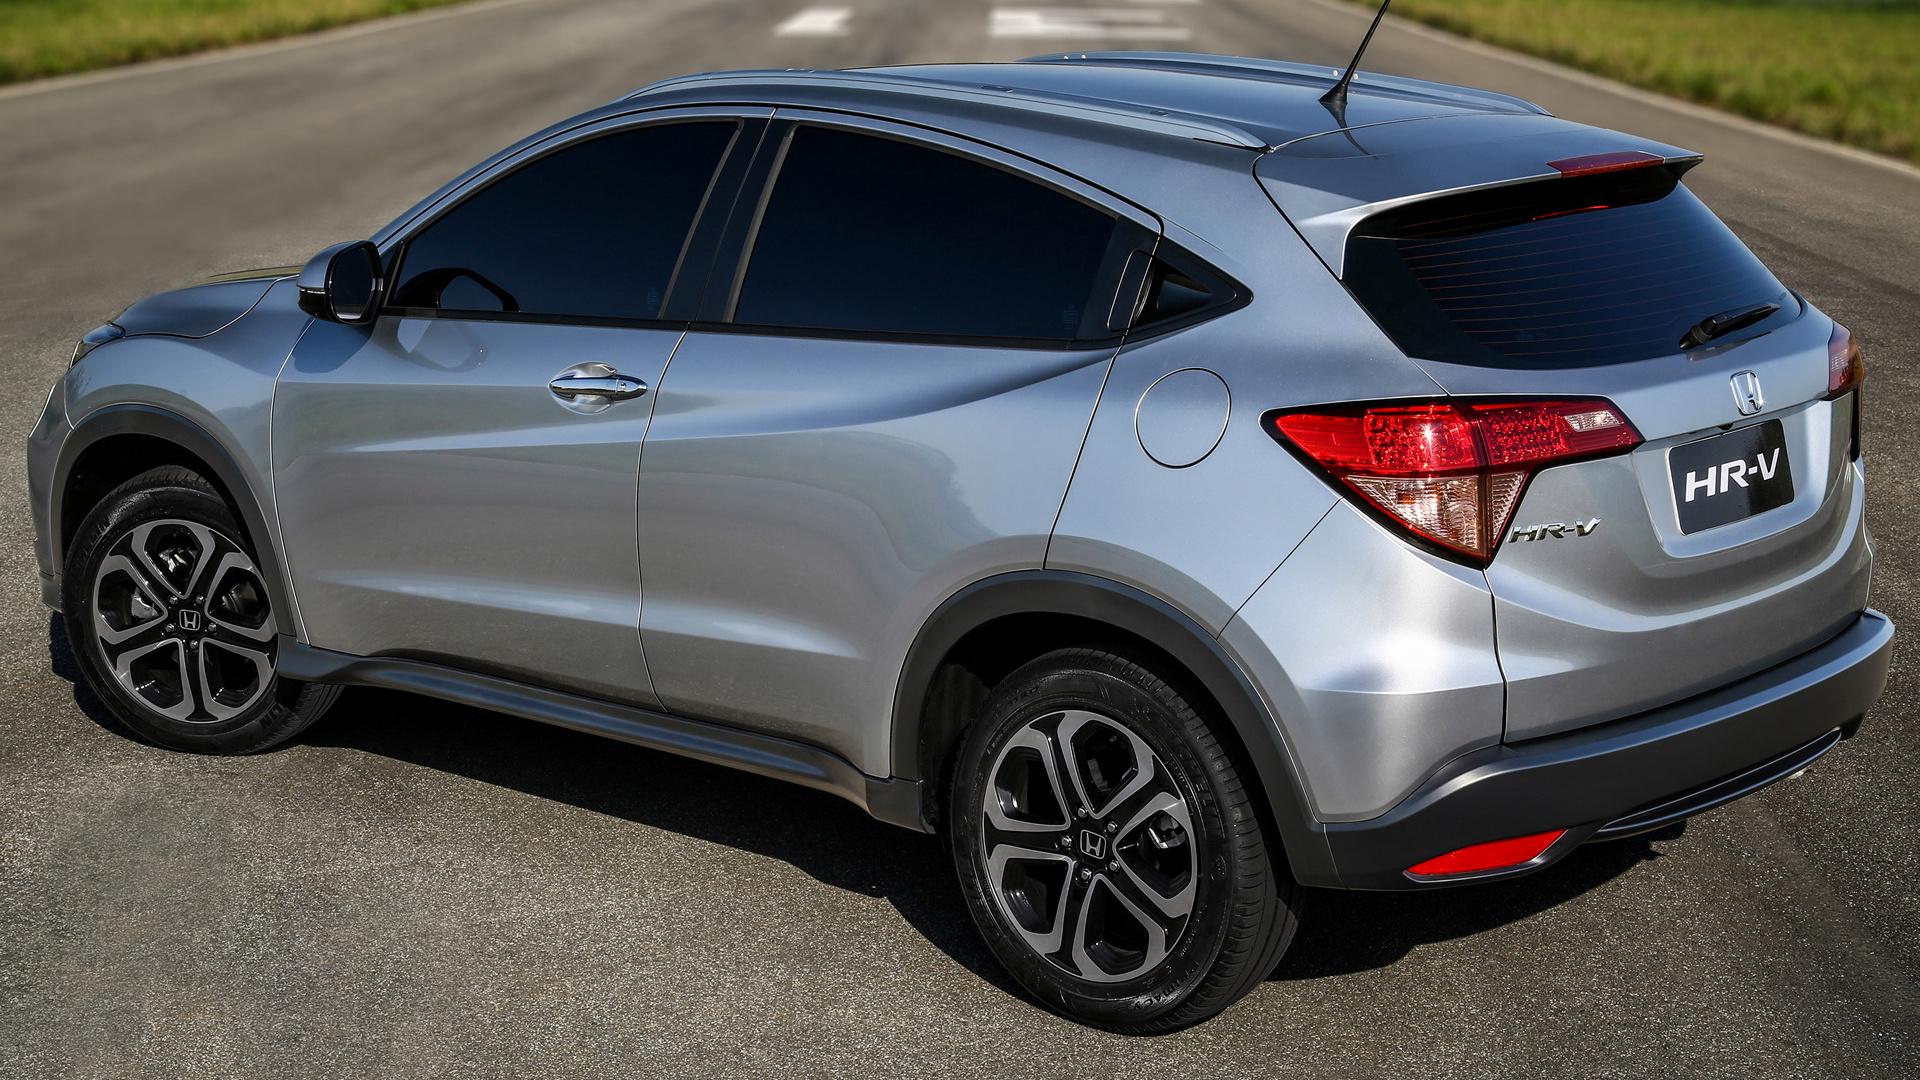 Honda HR-V (2015) BR Wallpapers and HD Images - Car Pixel